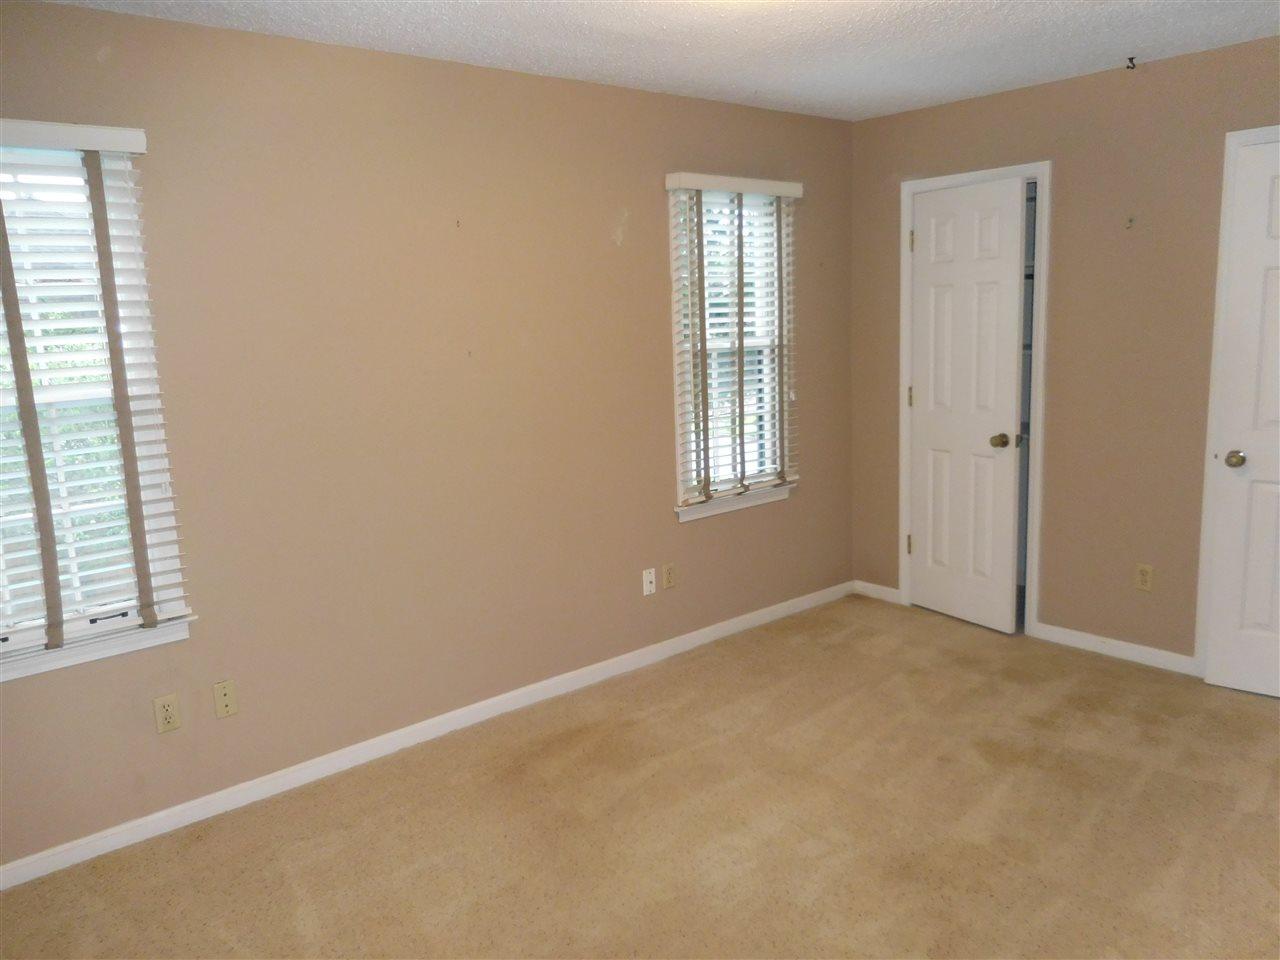 8125 Savannah, Germantown, TN 38138